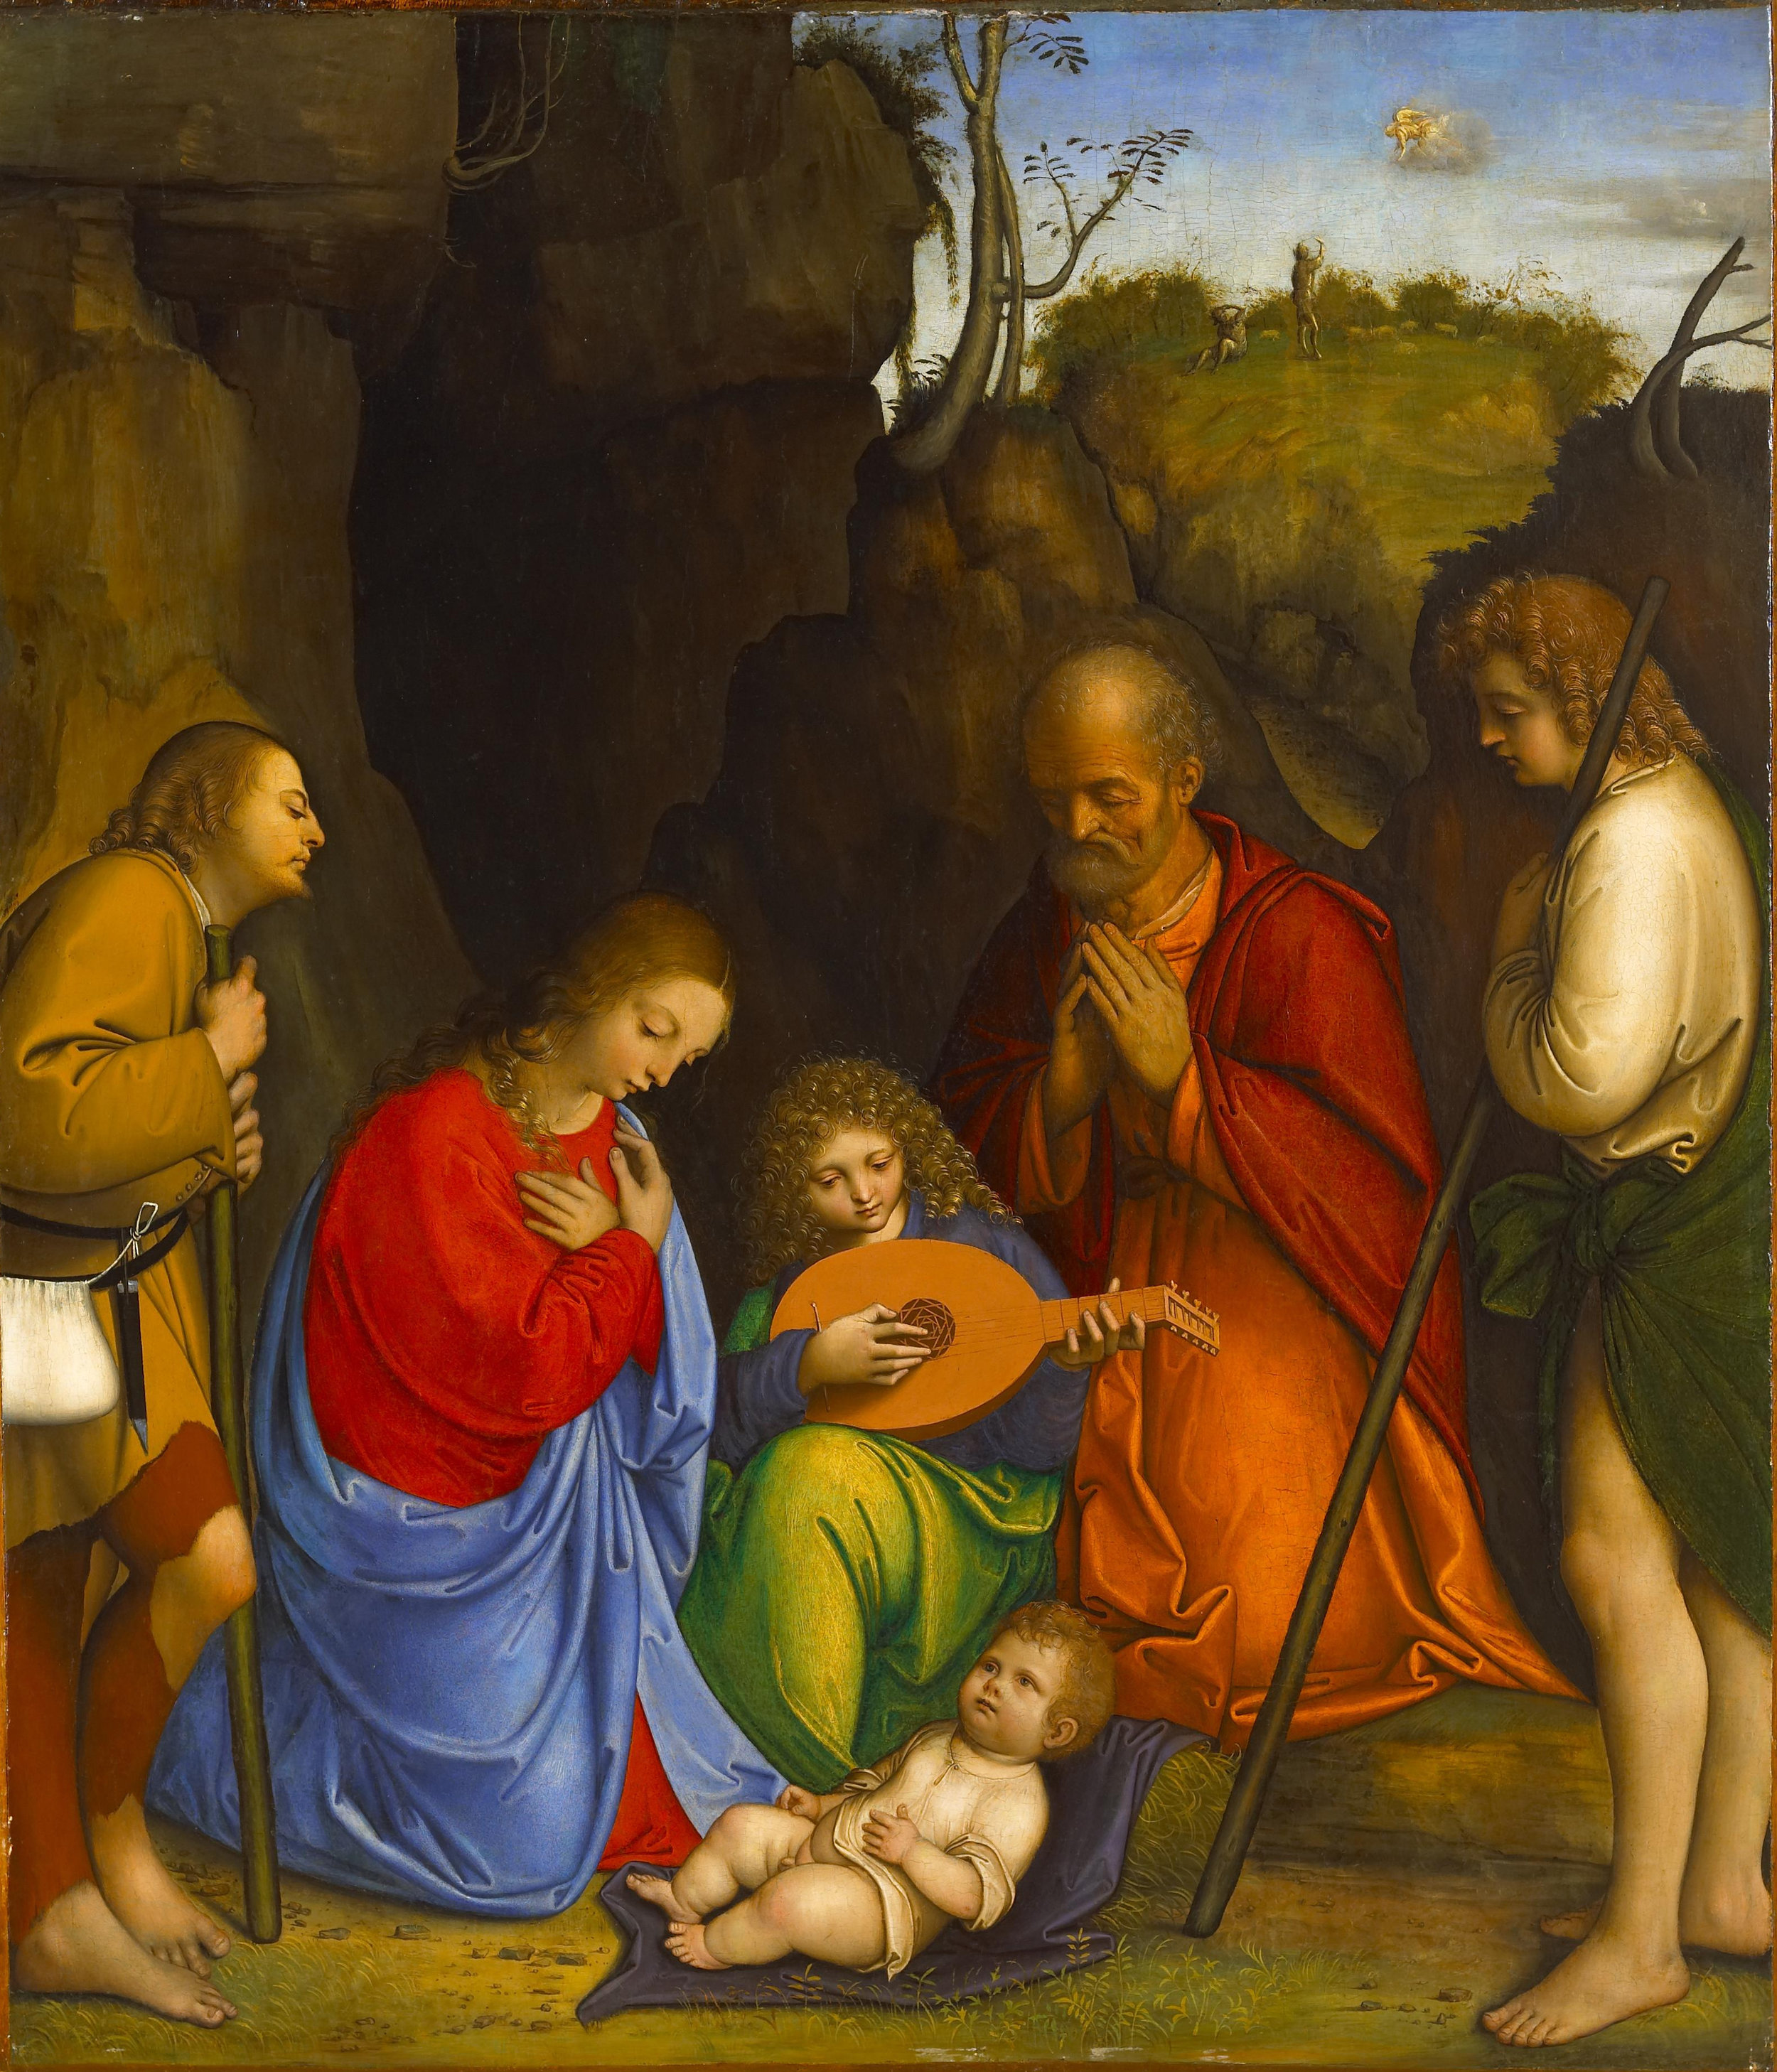 Giovanni Agostino da Lodi - Adoration of the Shepherds.jpg